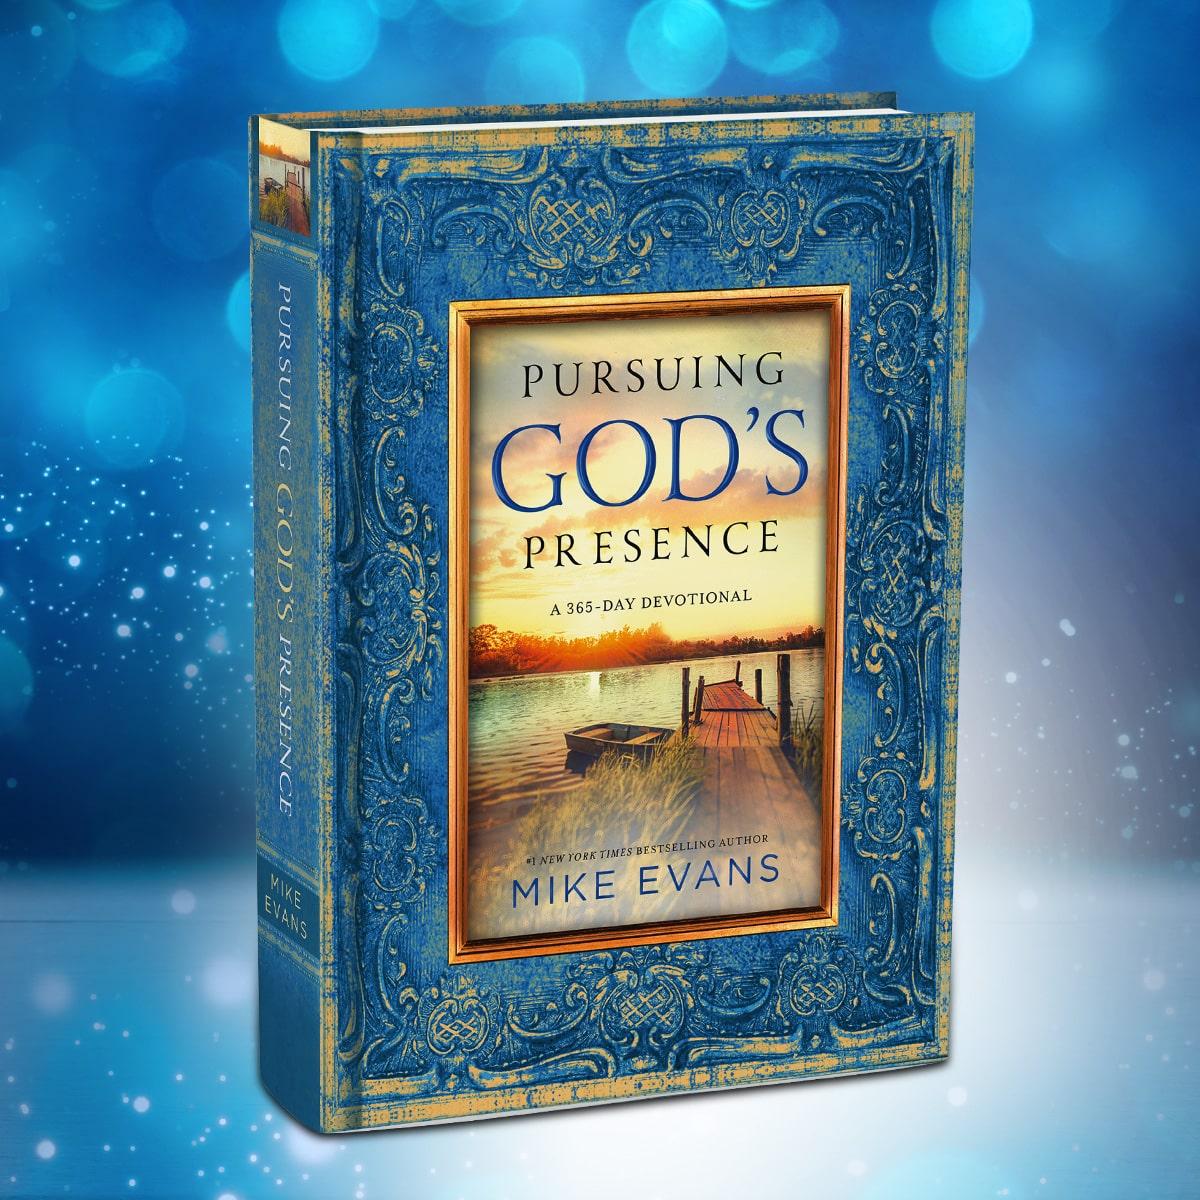 Pursuing God's Presence Daily Devotional